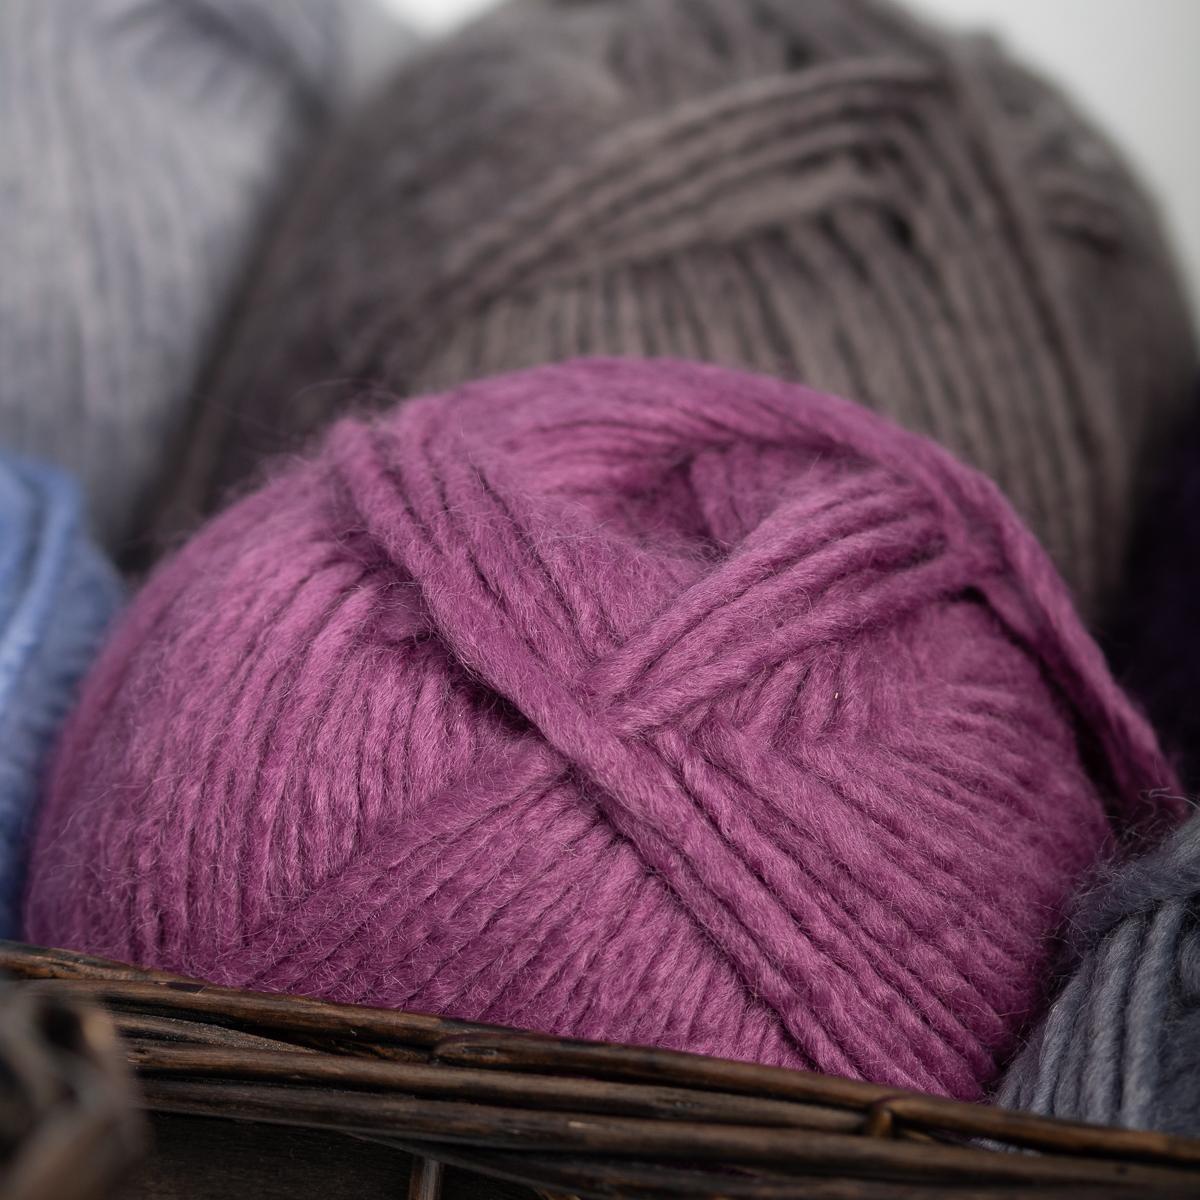 3pk-Lion-Brand-New-Basic-Acrylic-amp-Wool-Yarn-Medium-4-Knit-Crochet-Skeins-Soft thumbnail 74